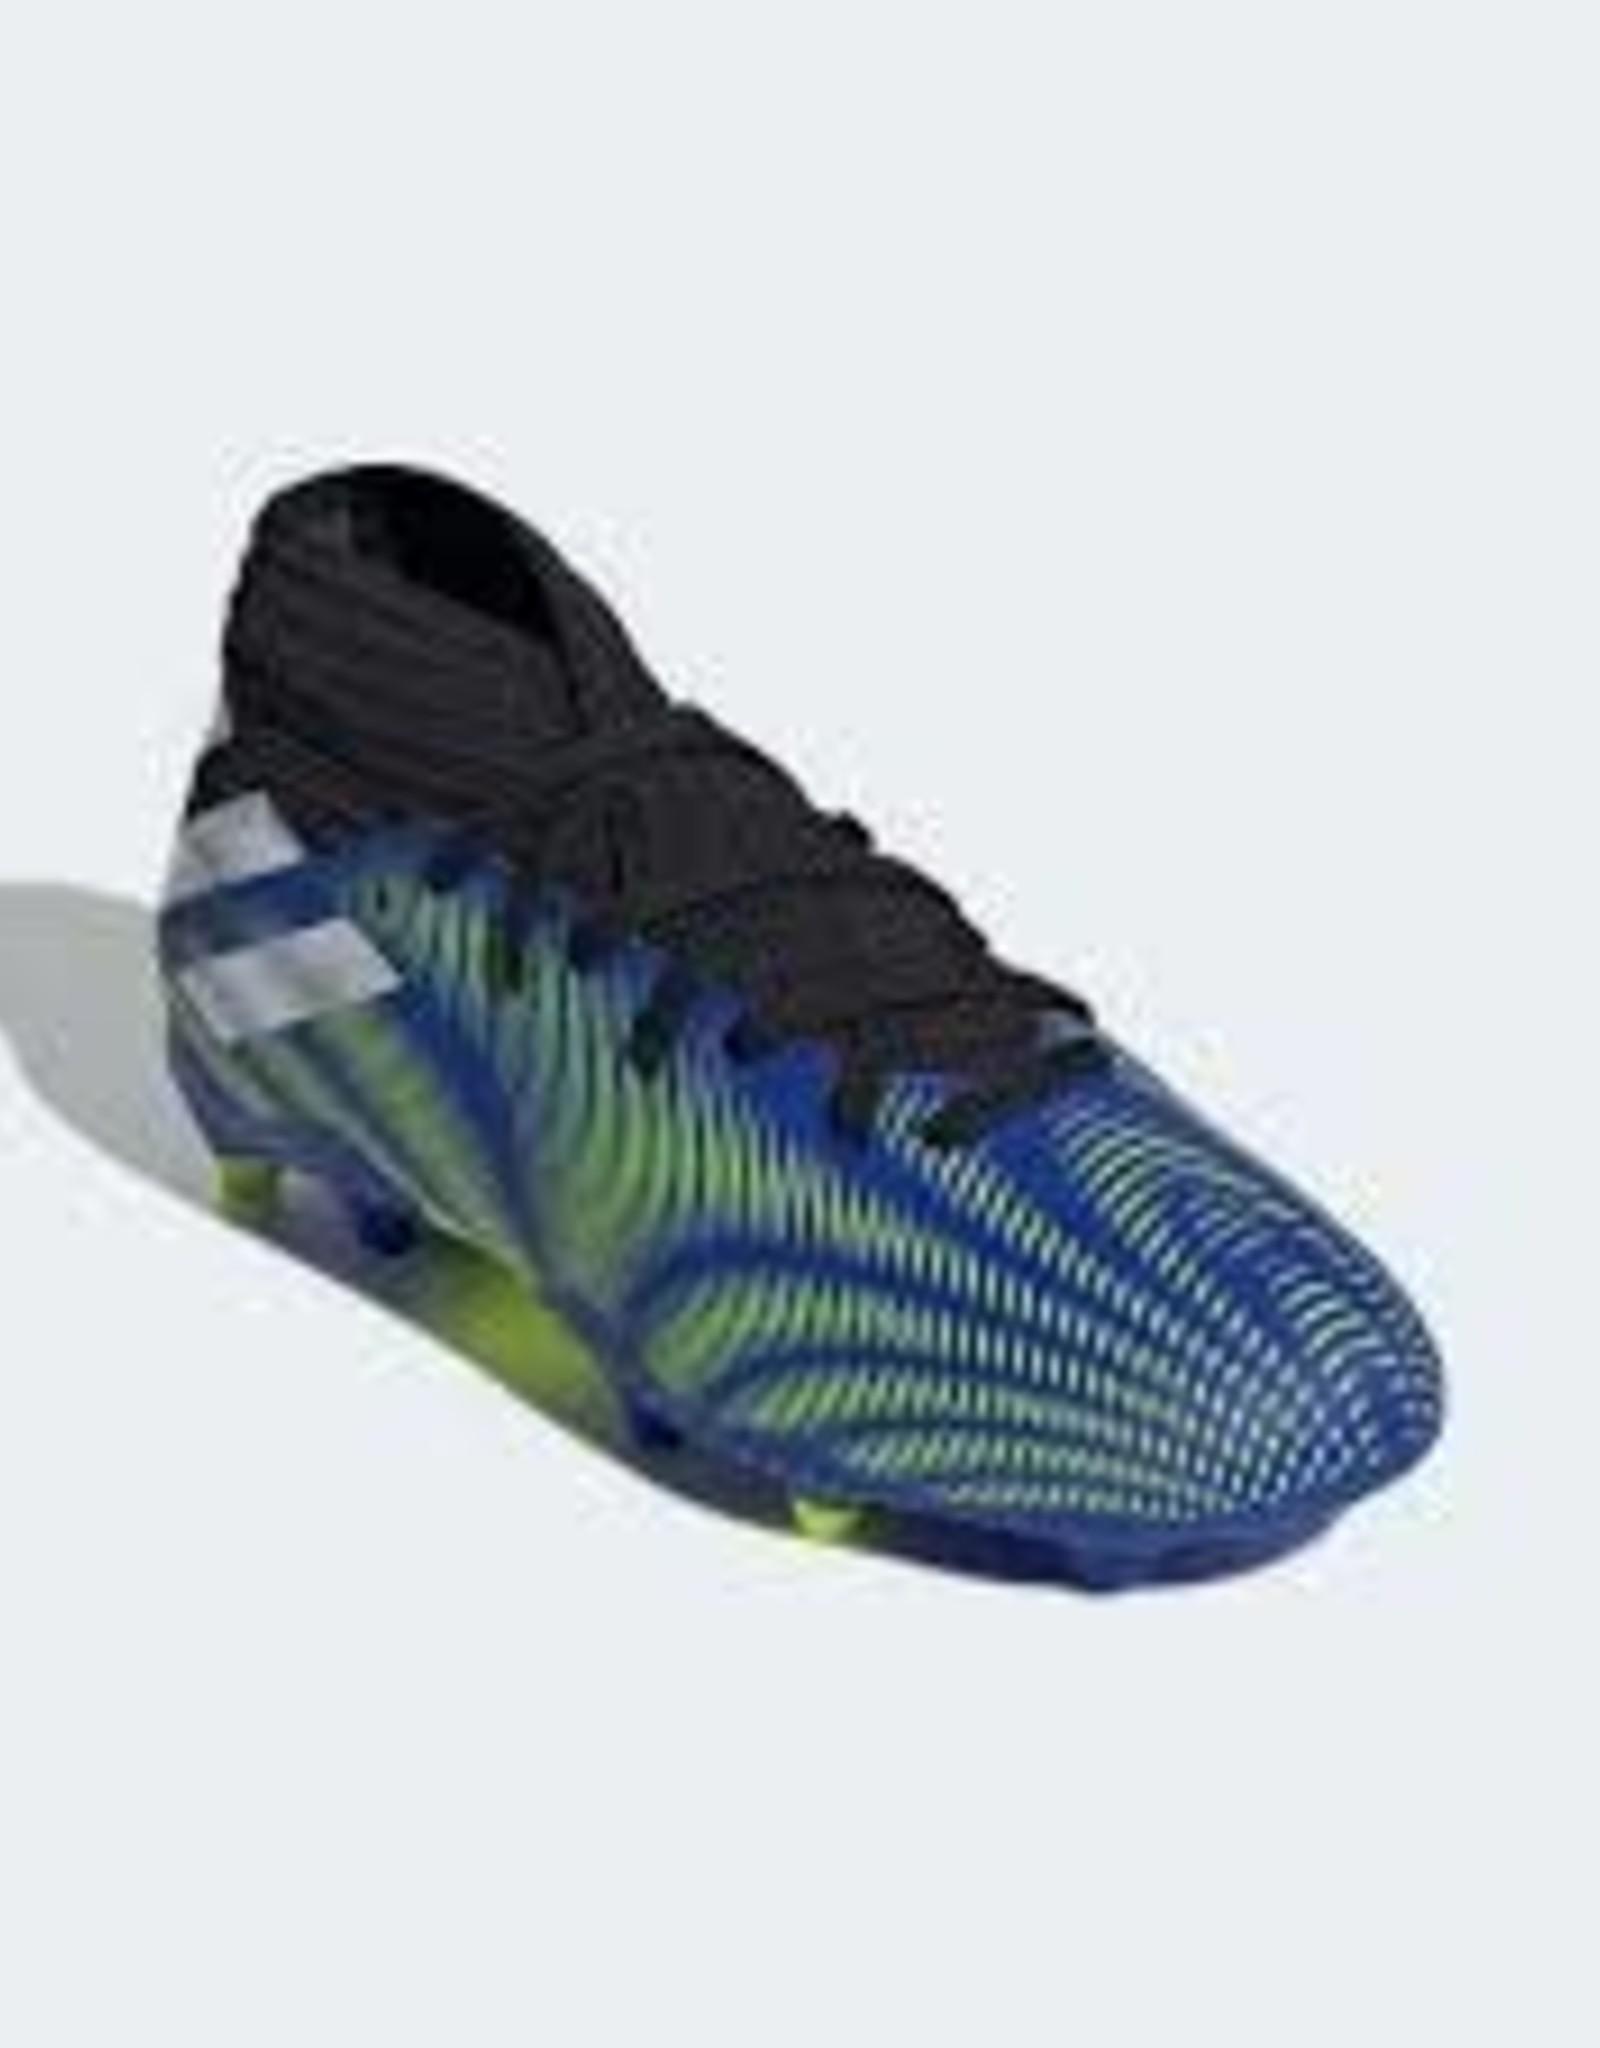 Adidas FG Nemeziz .3 jr